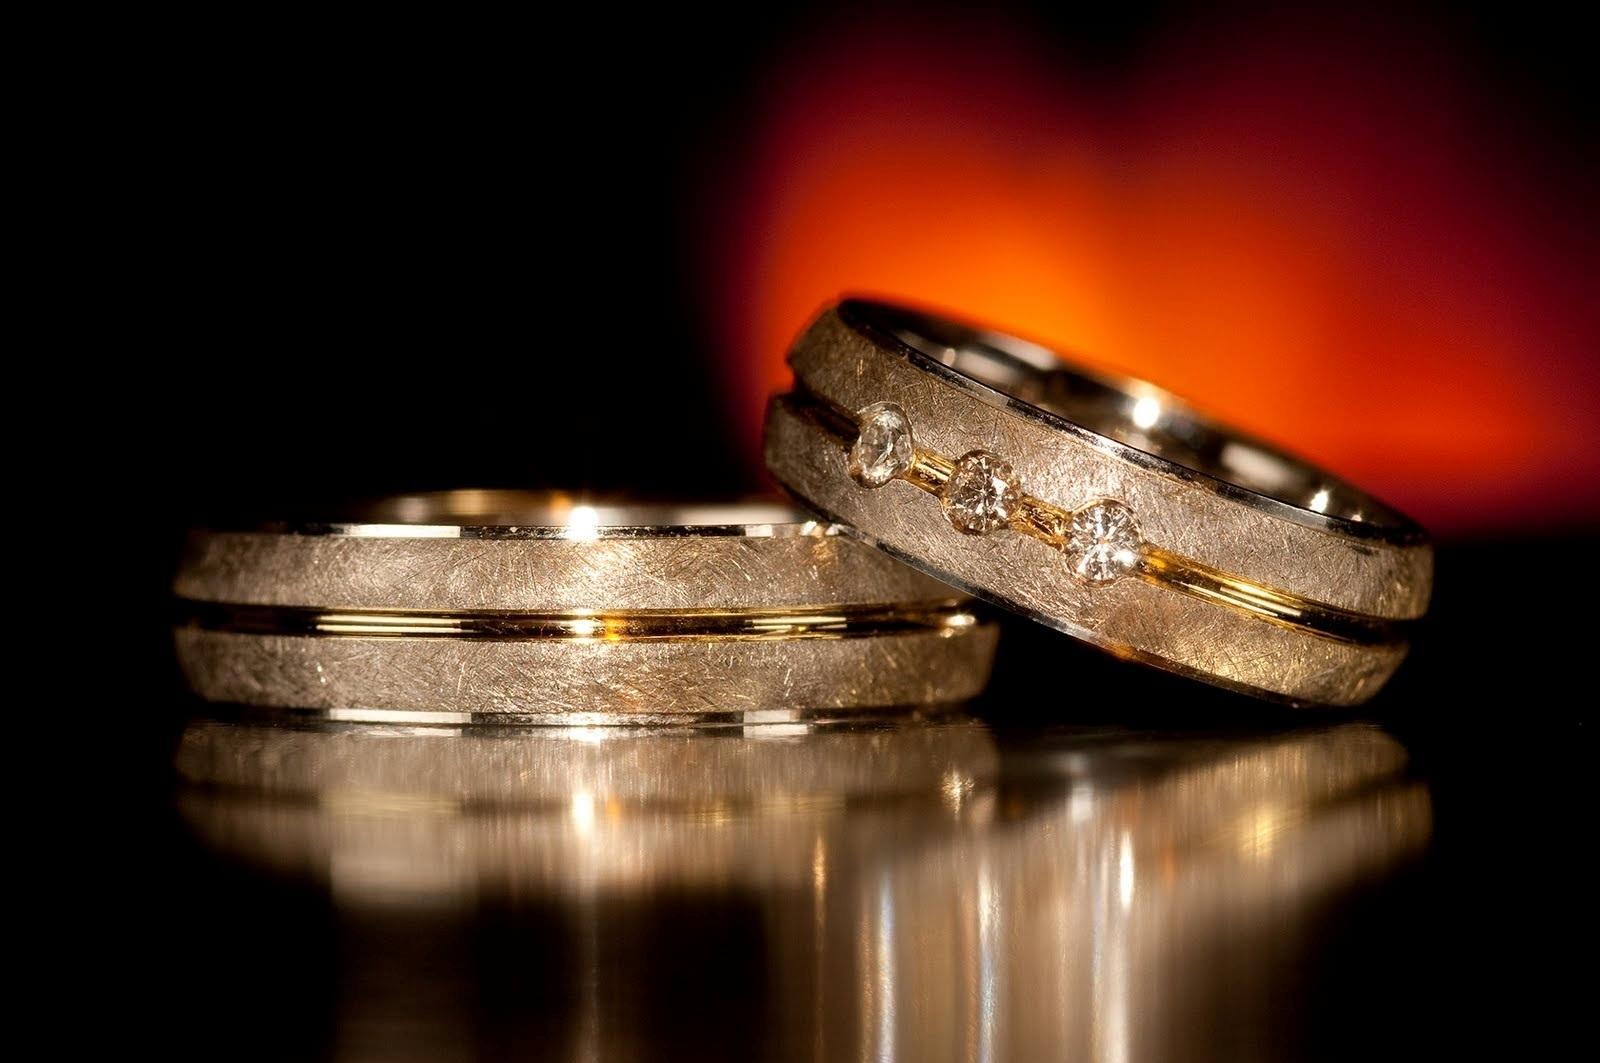 Wedding Rings. Tanzanite Engagement Rings. Citrine Stone Rings. Movie Star Rings. Sr Name Engagement Rings. Semi Mount Wedding Rings. Unique Colored Wedding Wedding Rings. Ring Lamar Engagement Rings. $3000 Wedding Rings